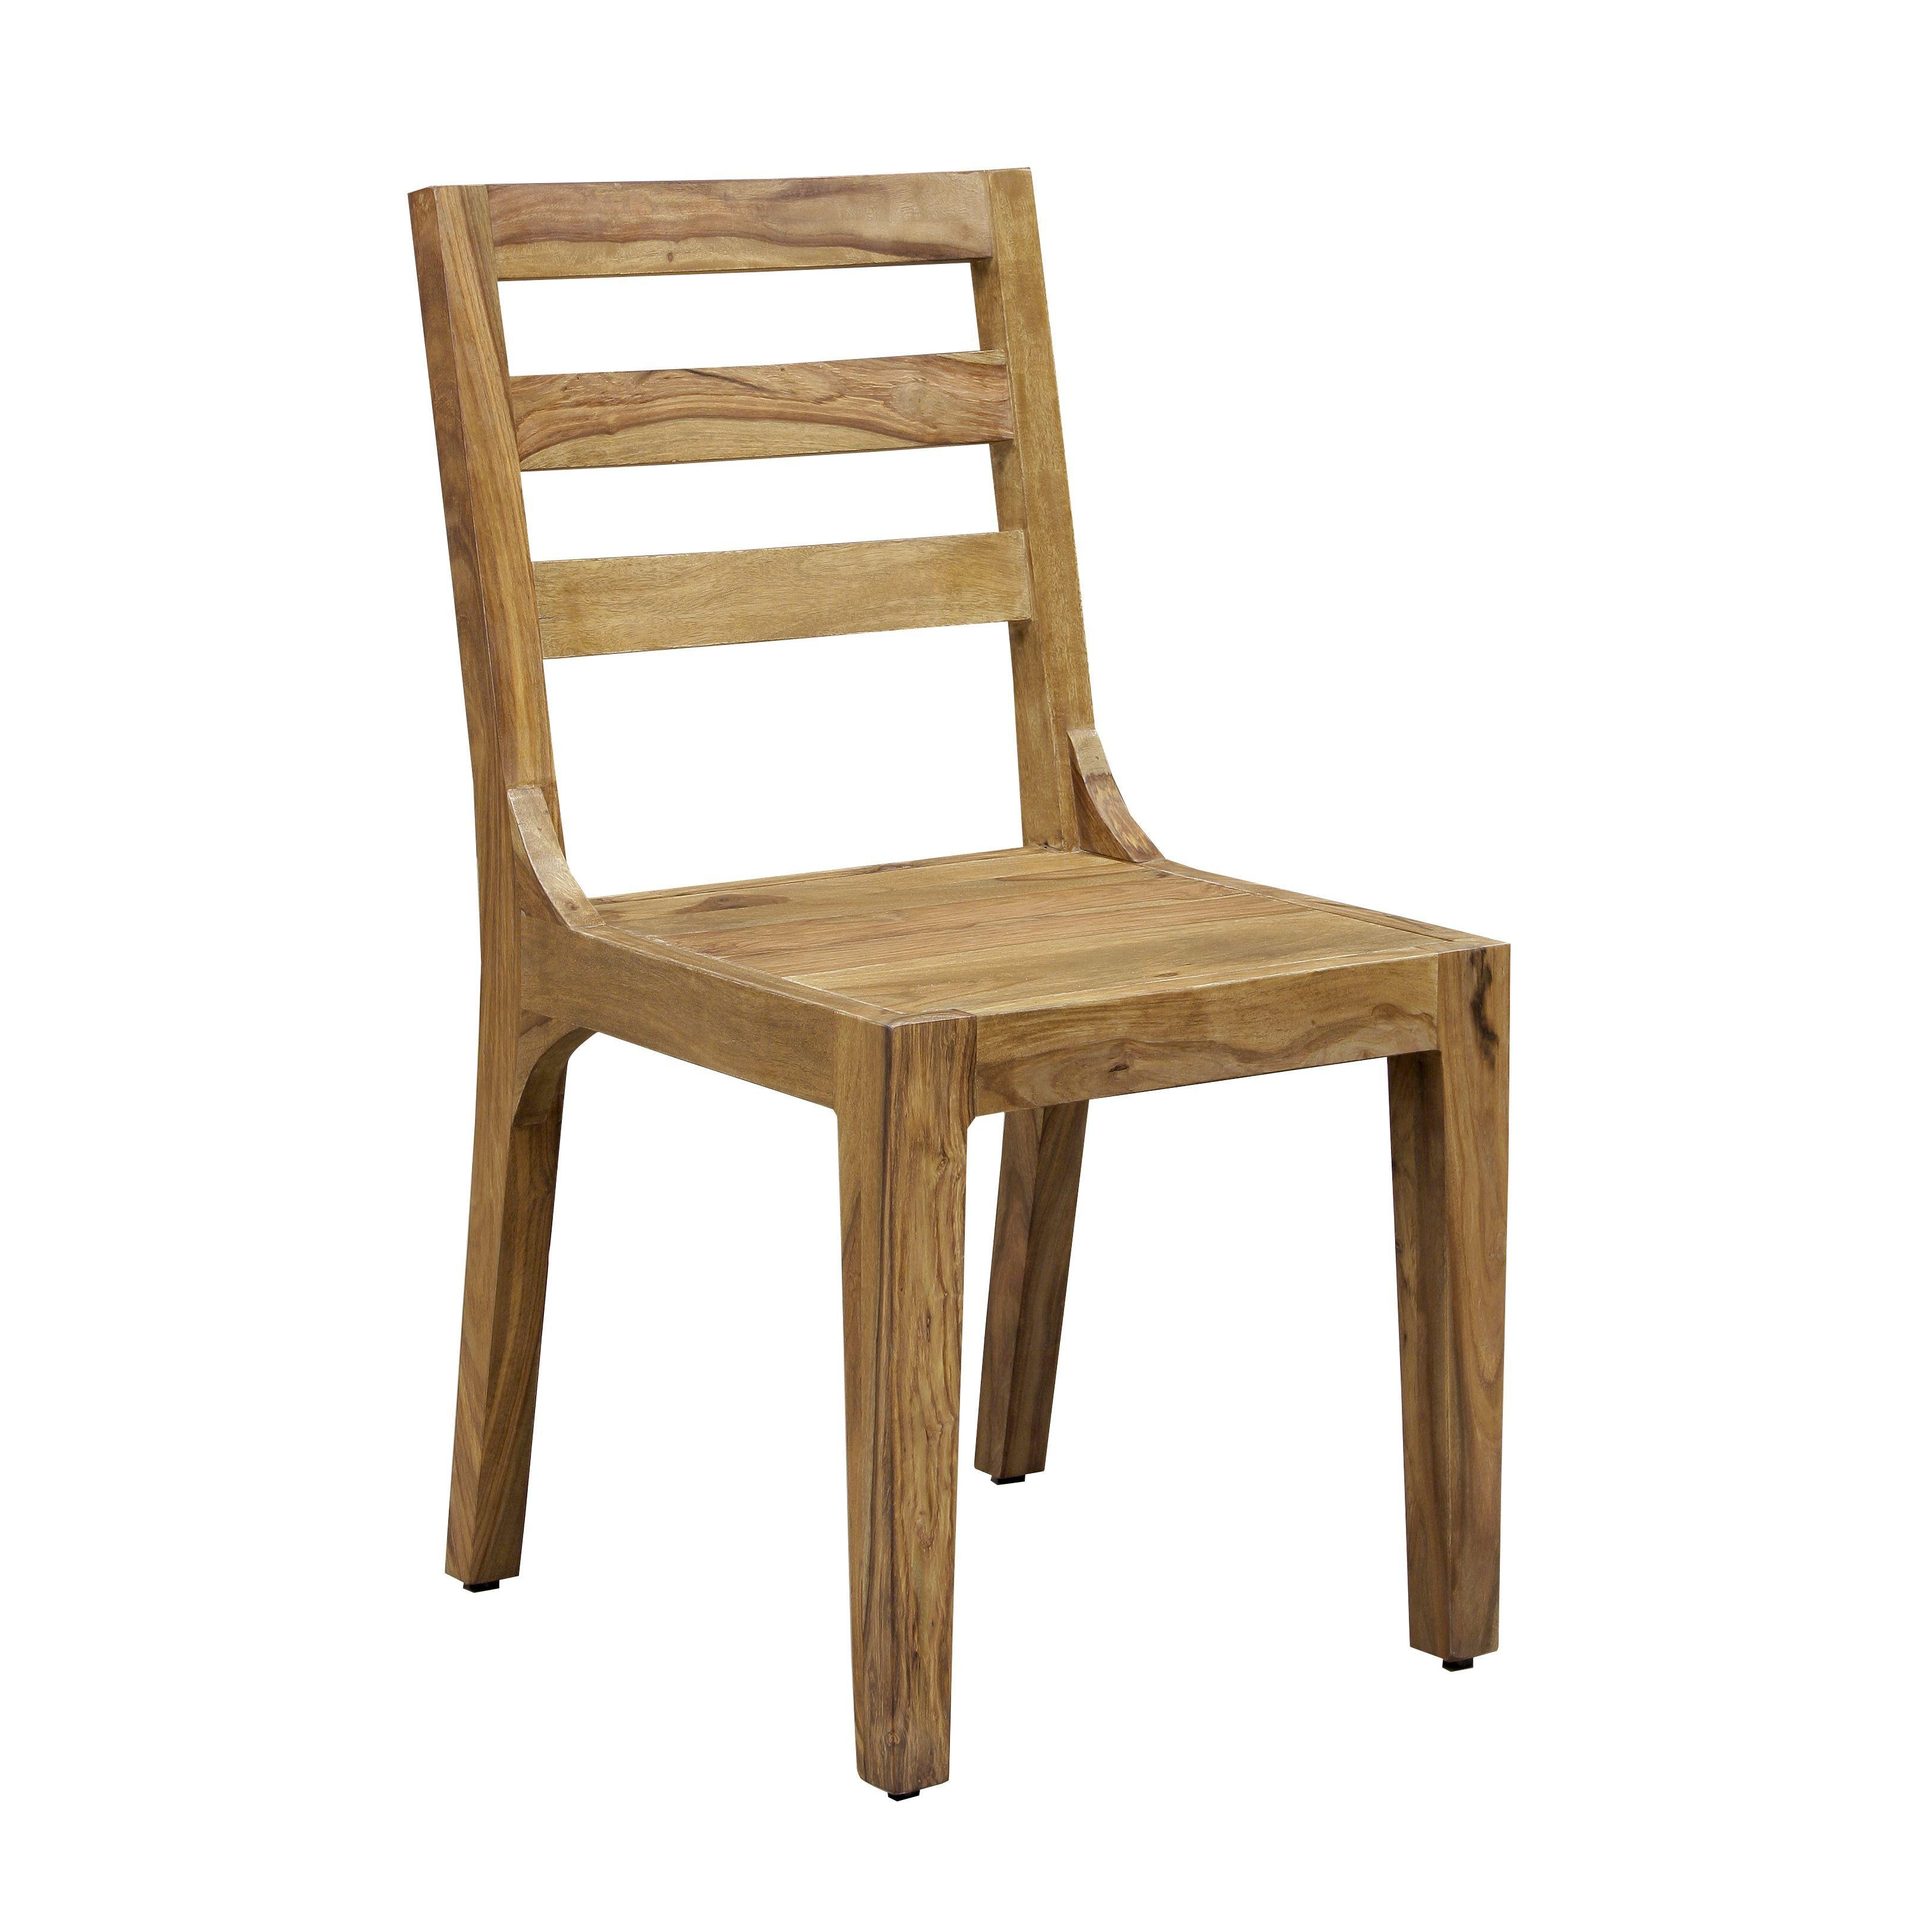 Swell Porter International Designs Handmade Wanderloot Urban Pdpeps Interior Chair Design Pdpepsorg